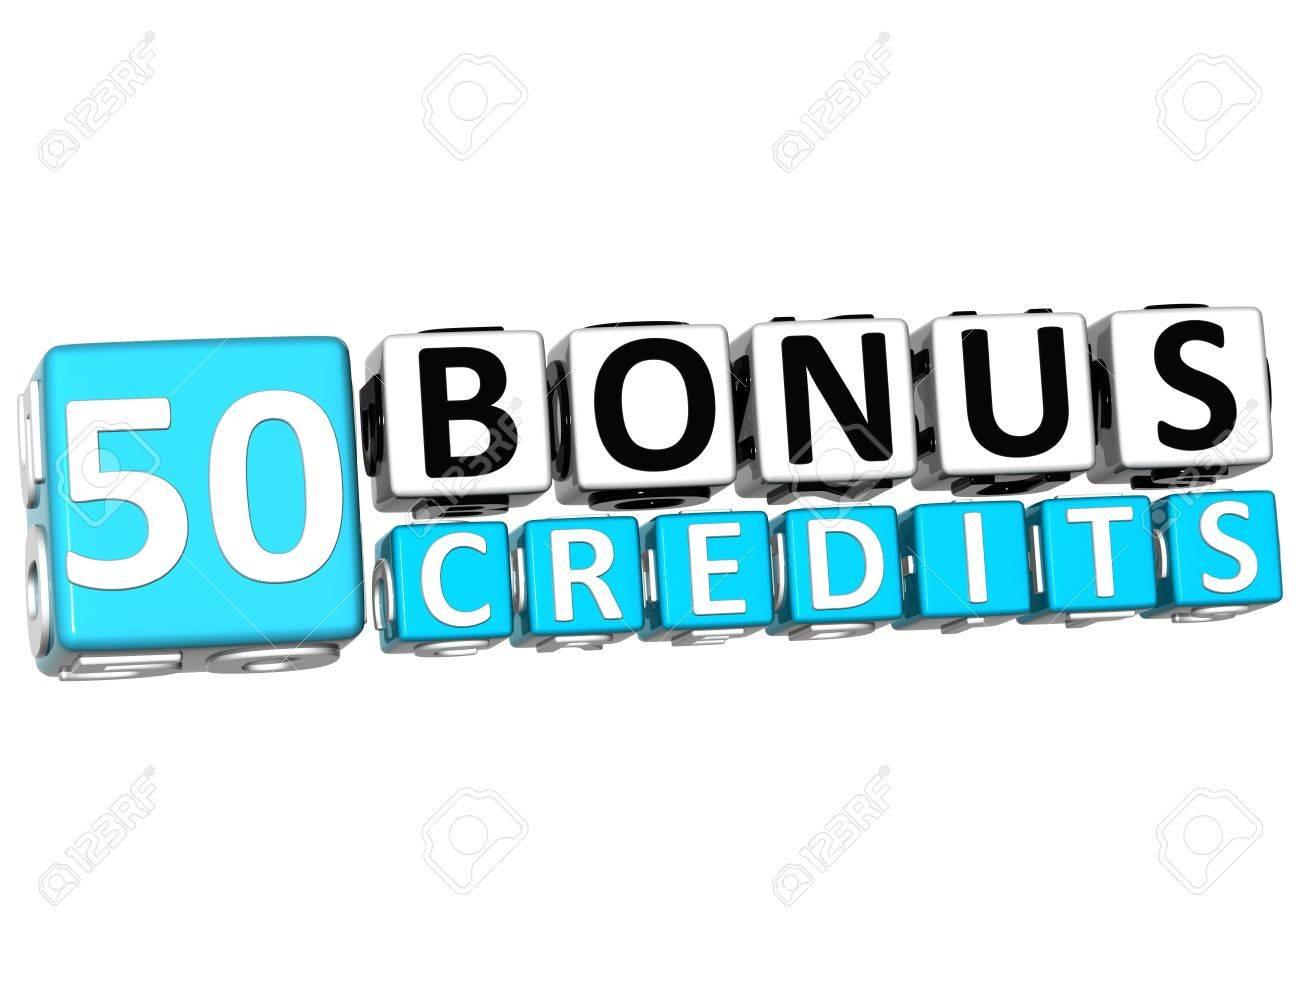 3D Get 50 Bonus Credits Block Letters over white background Stock Photo - 12570161